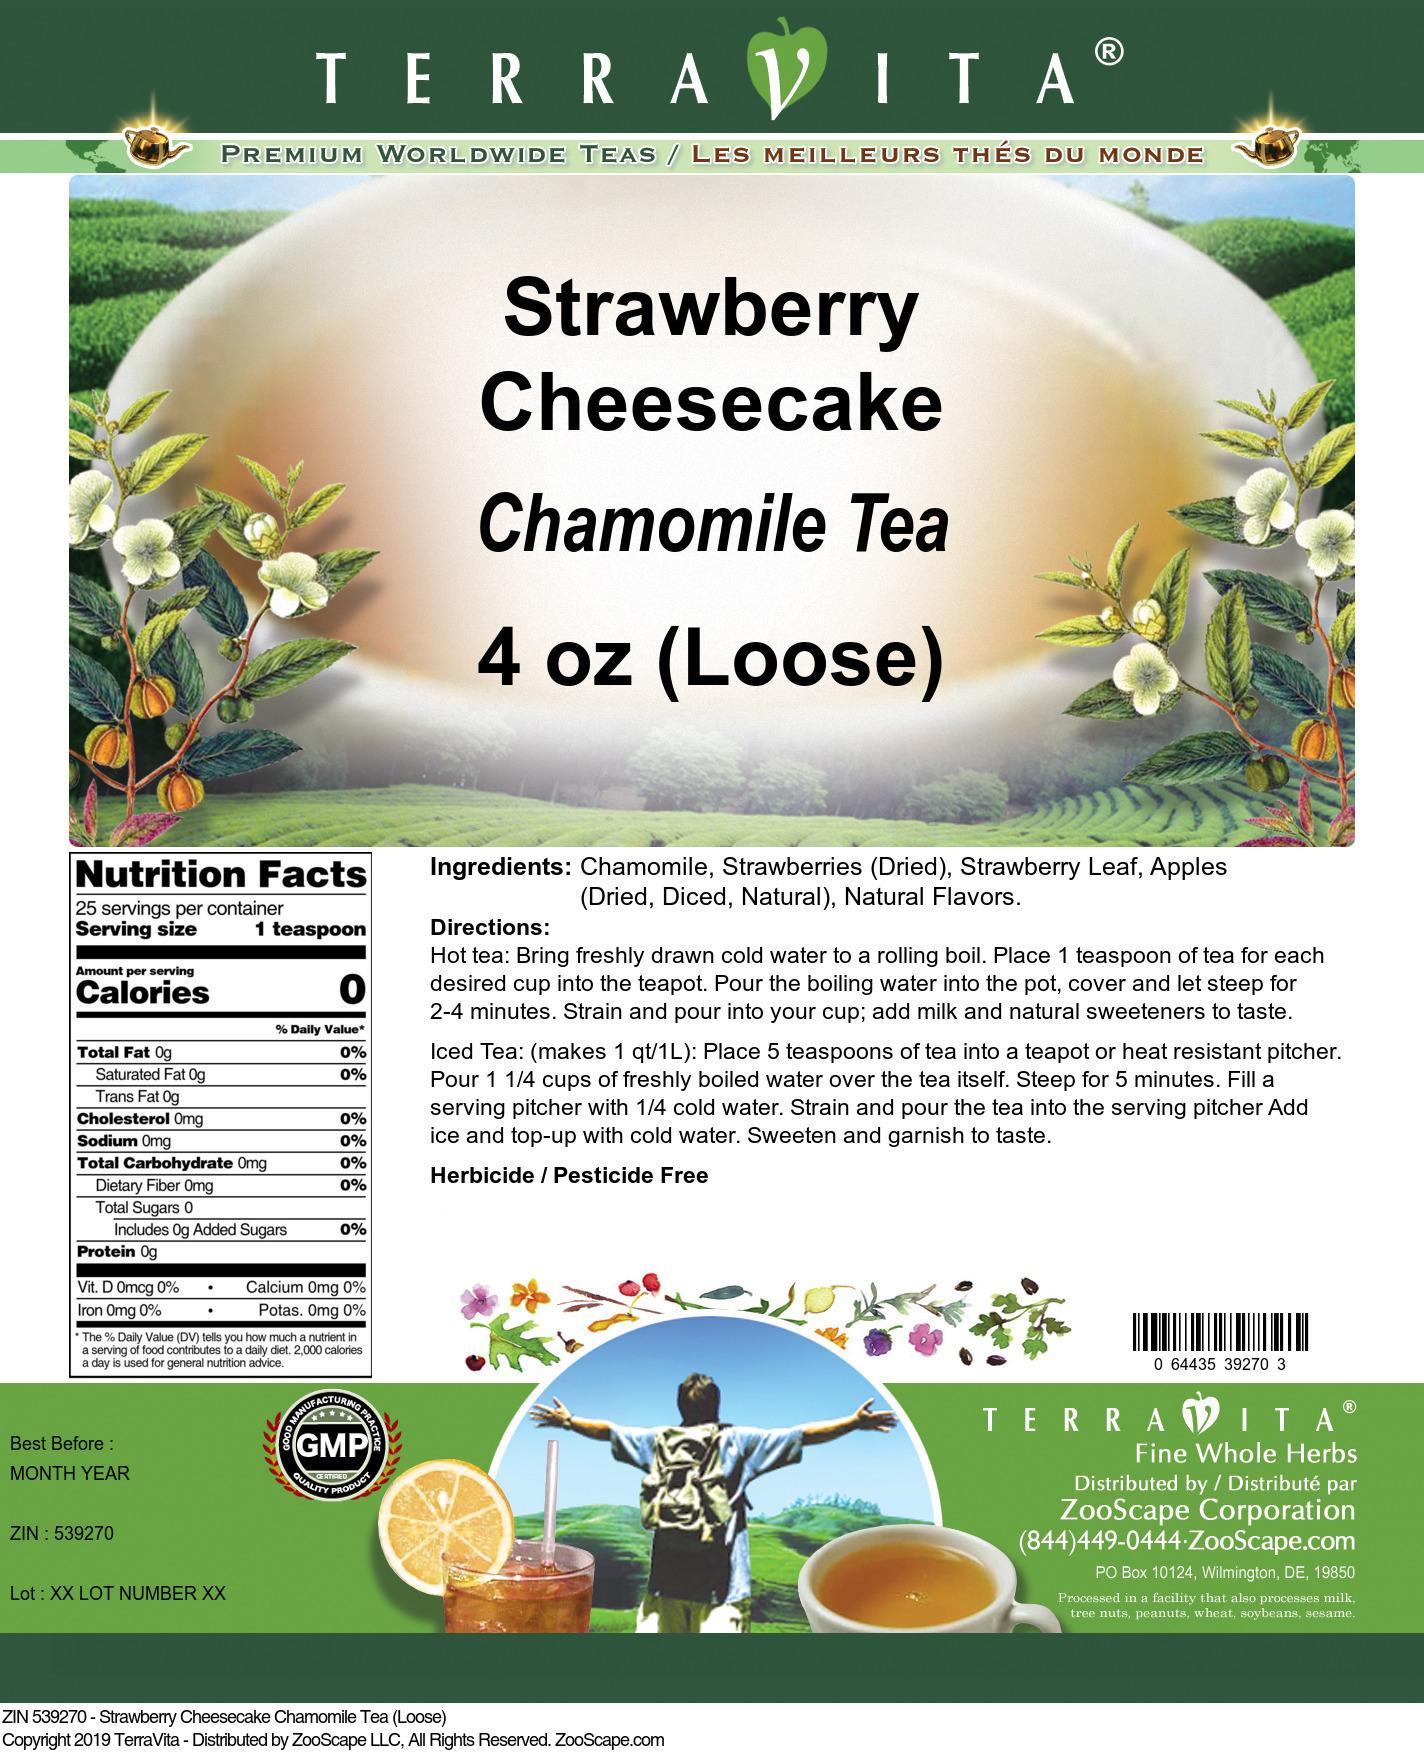 Strawberry Cheesecake Chamomile Tea (Loose)